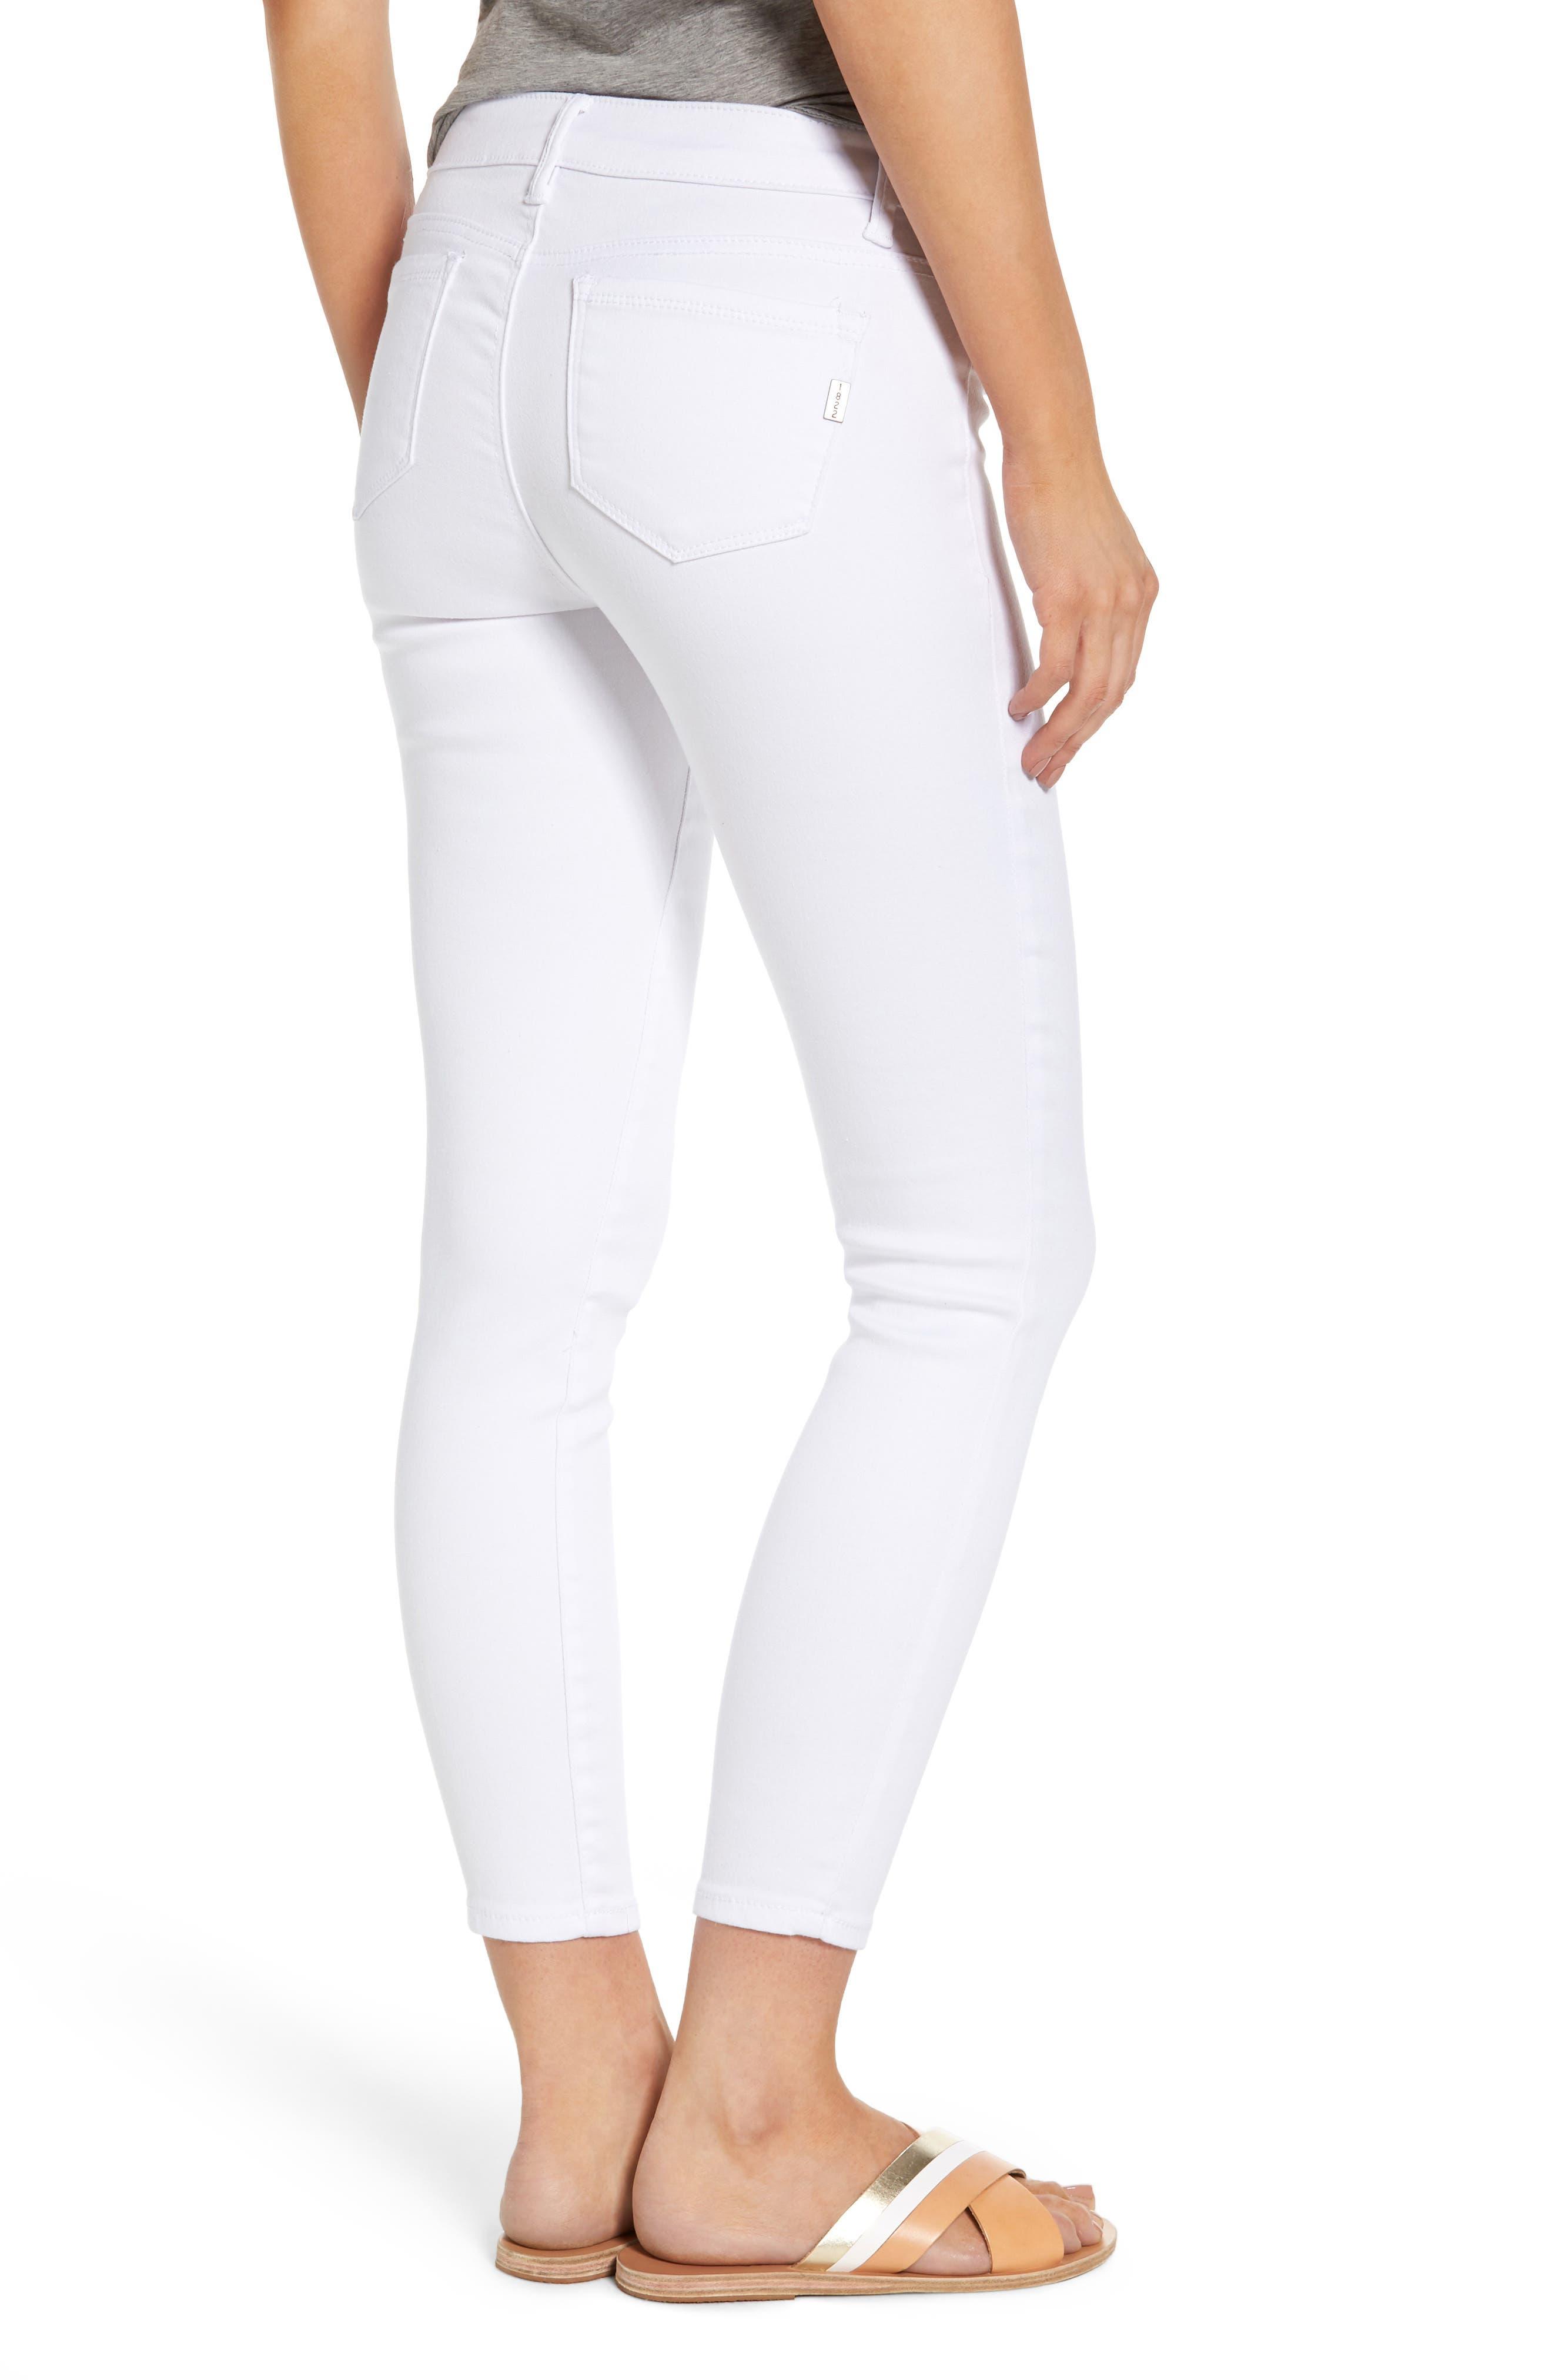 1822 Butter Skinny Jeans,                             Alternate thumbnail 2, color,                             Wht